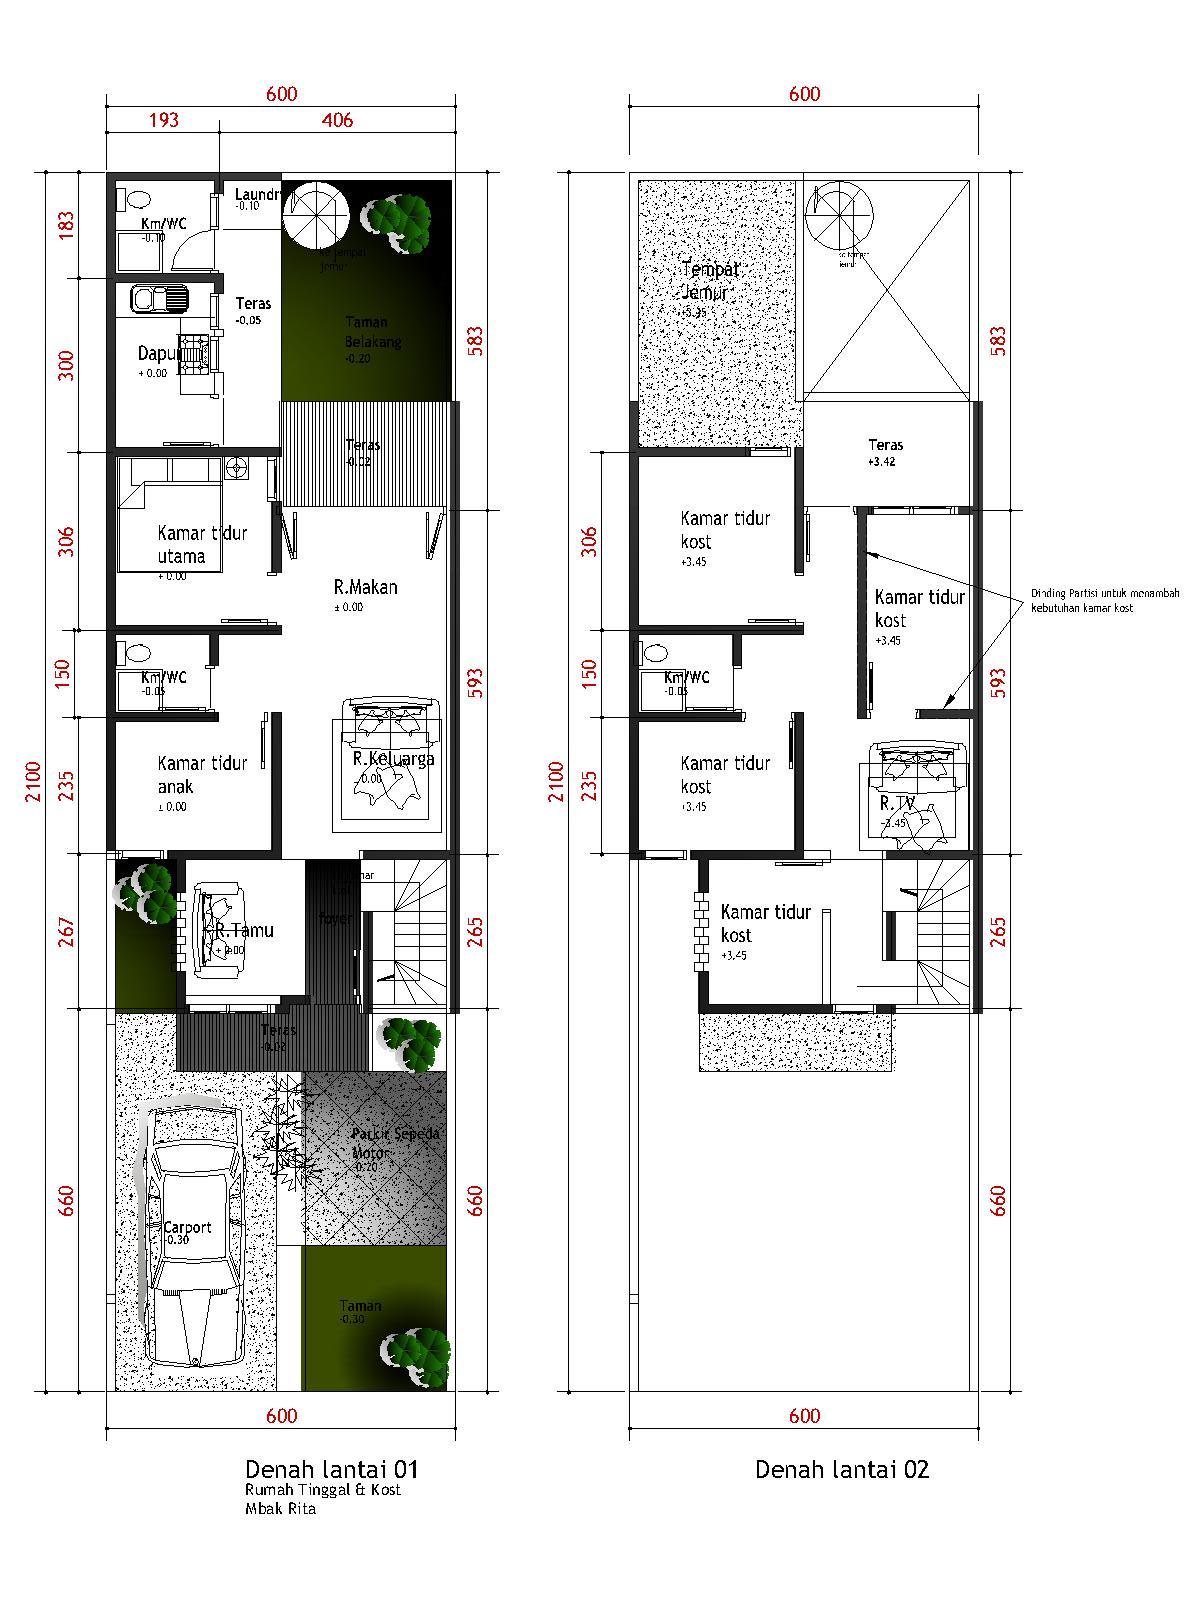 Desain Rumah Minimalis 2 Lantai Type 21 2016 Prathama Raghavan